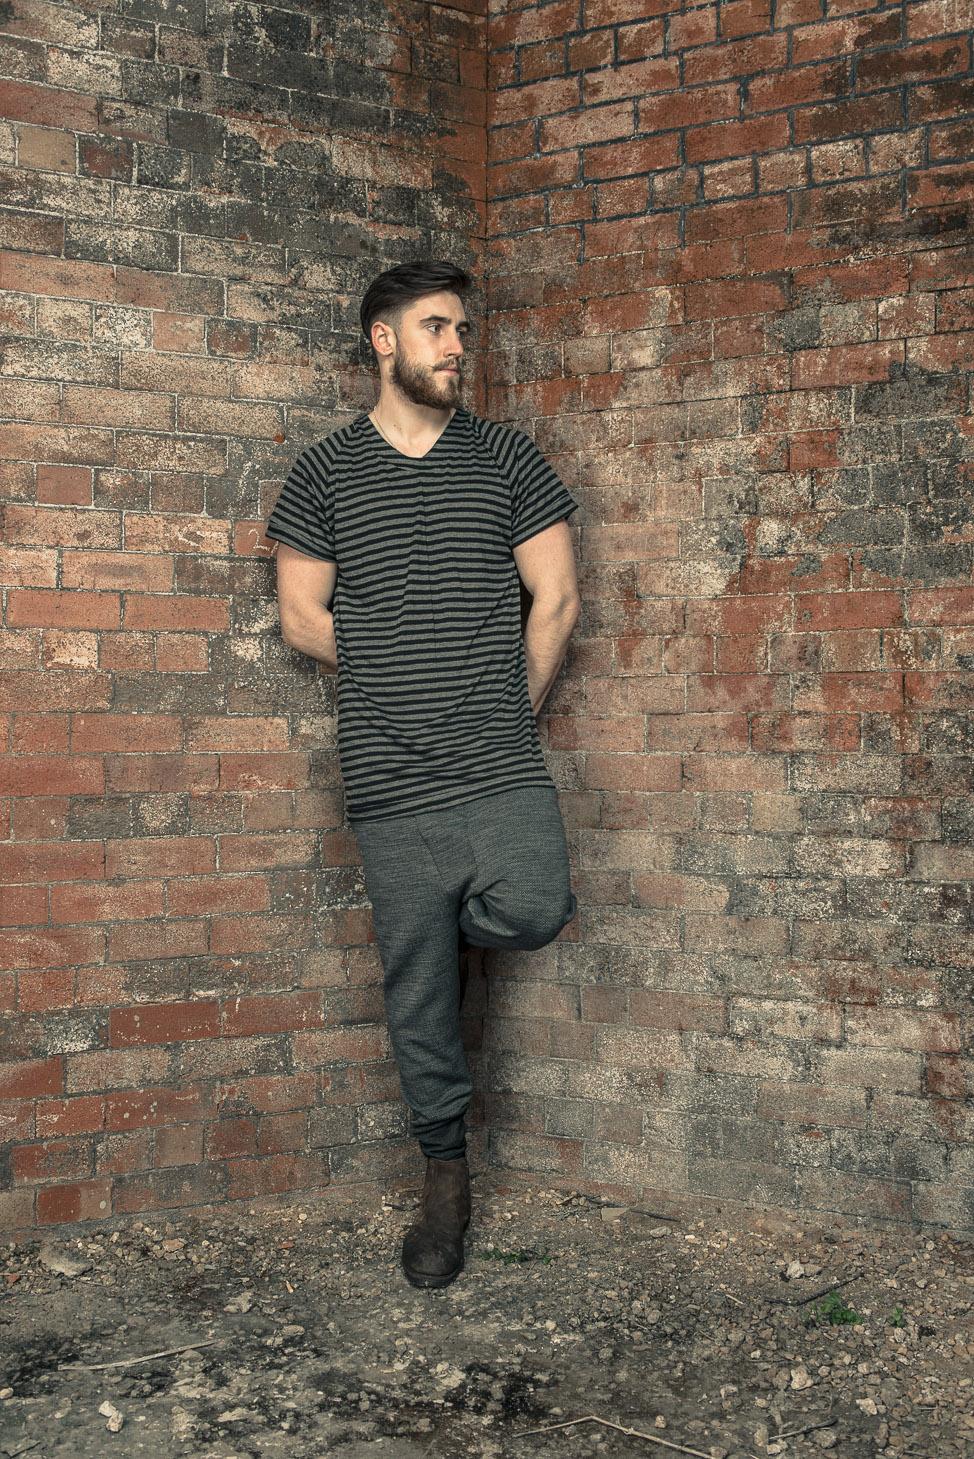 zaramia-ava-zaramiaava-leeds-fashion-designer-ethical-sustainable-tailored-minimalist-stripe-oversized-taichi-raglan-versatile-drape-grey-tshirt-top-vest-hareem-trousers-black-grey-texture-styling-5